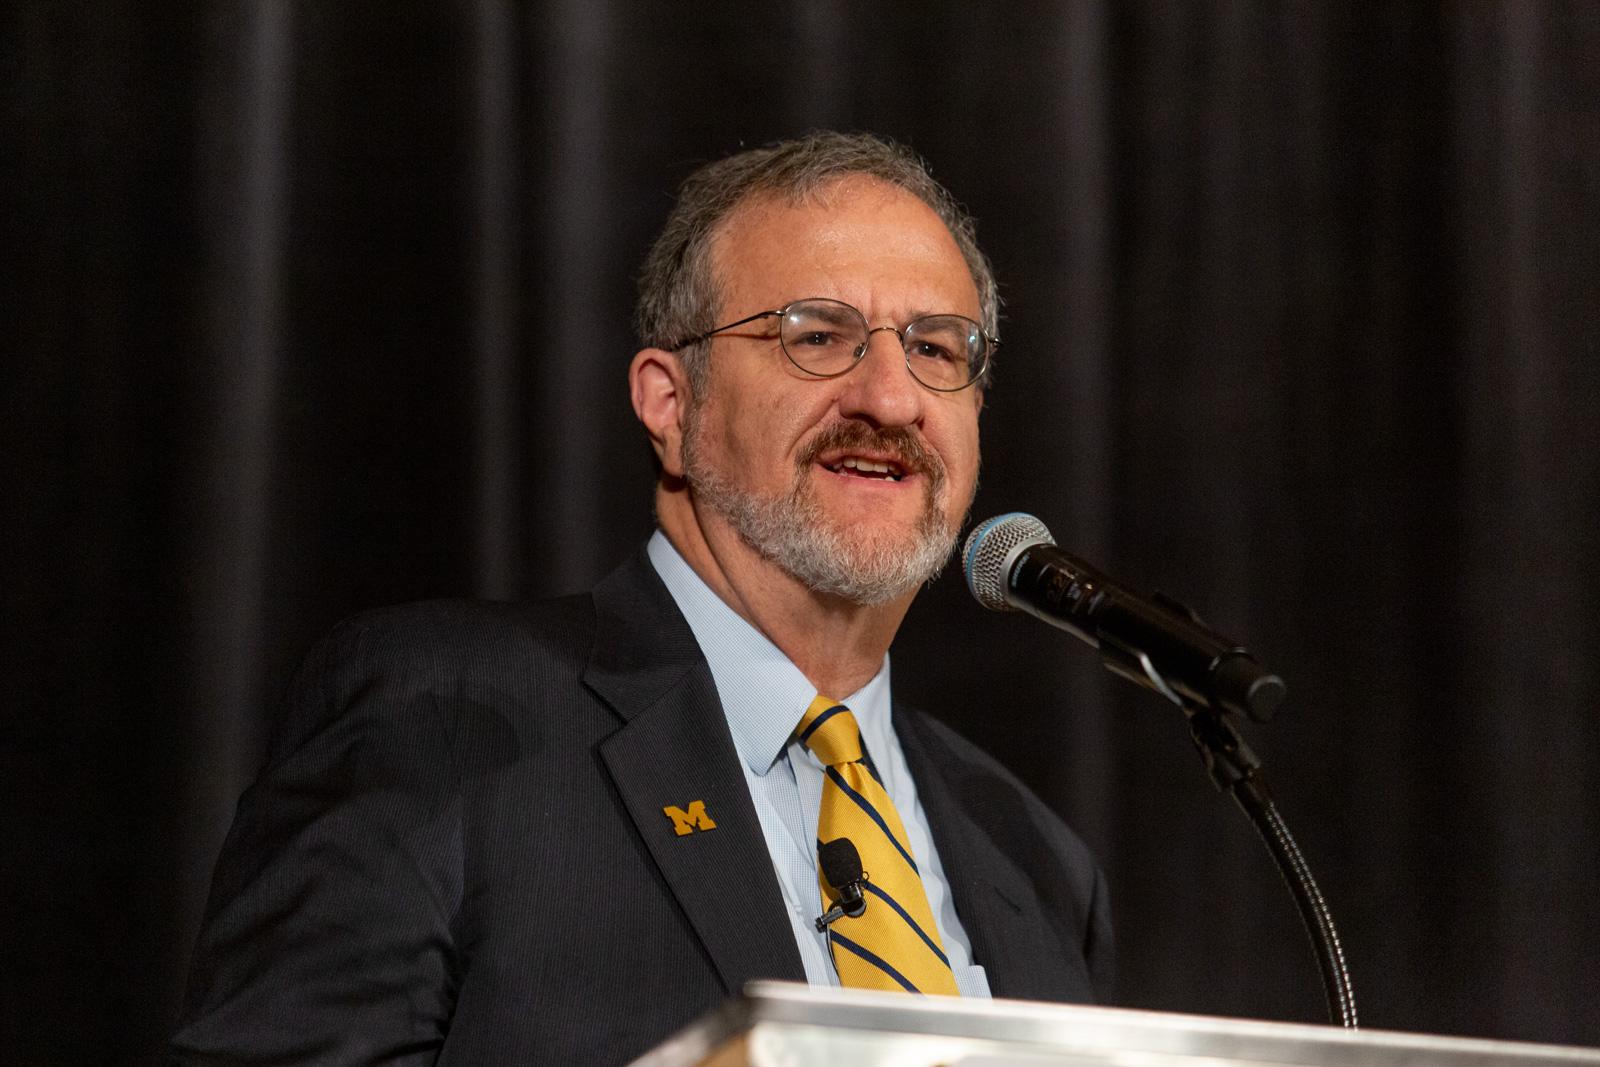 Mark Schlissel, President of The University of Michigan